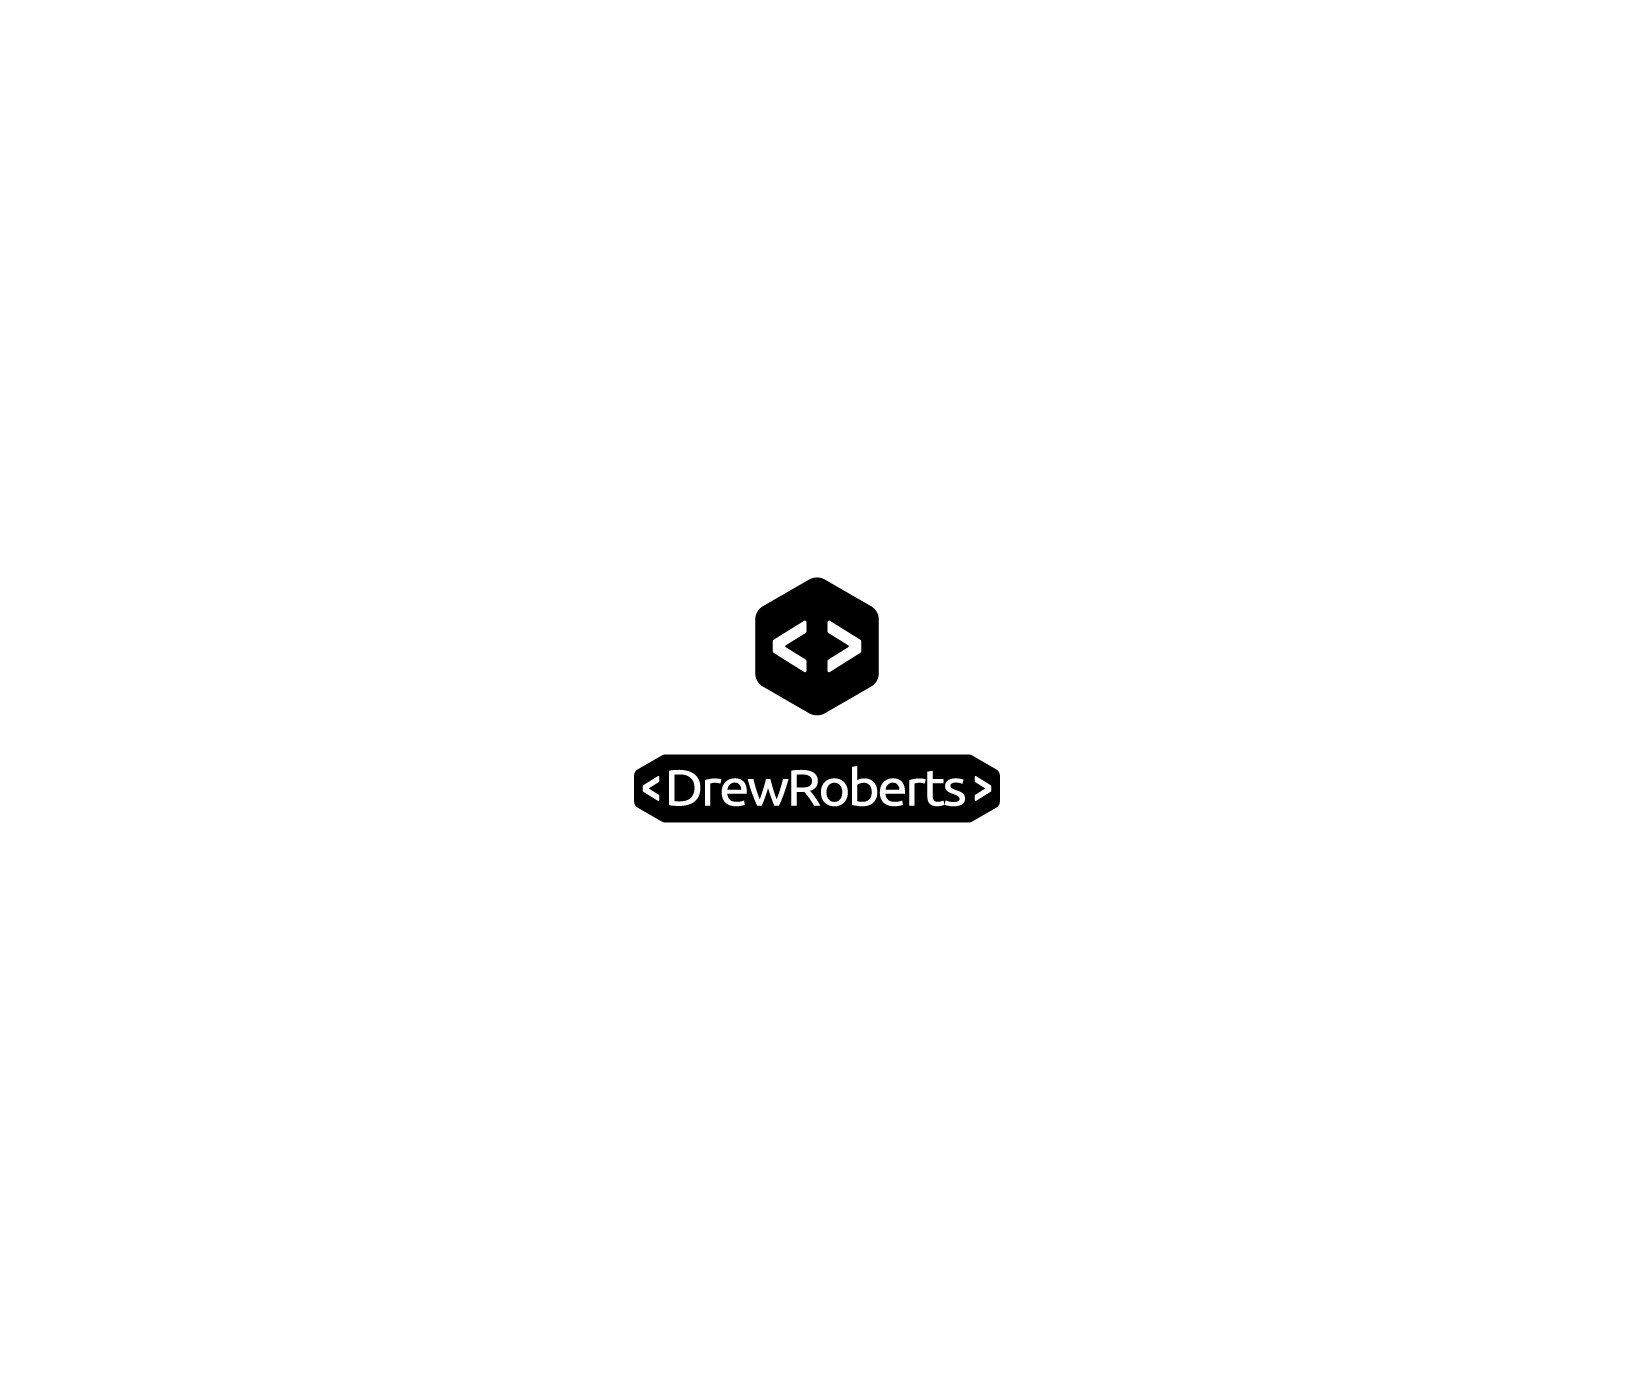 Sister Logo Designs